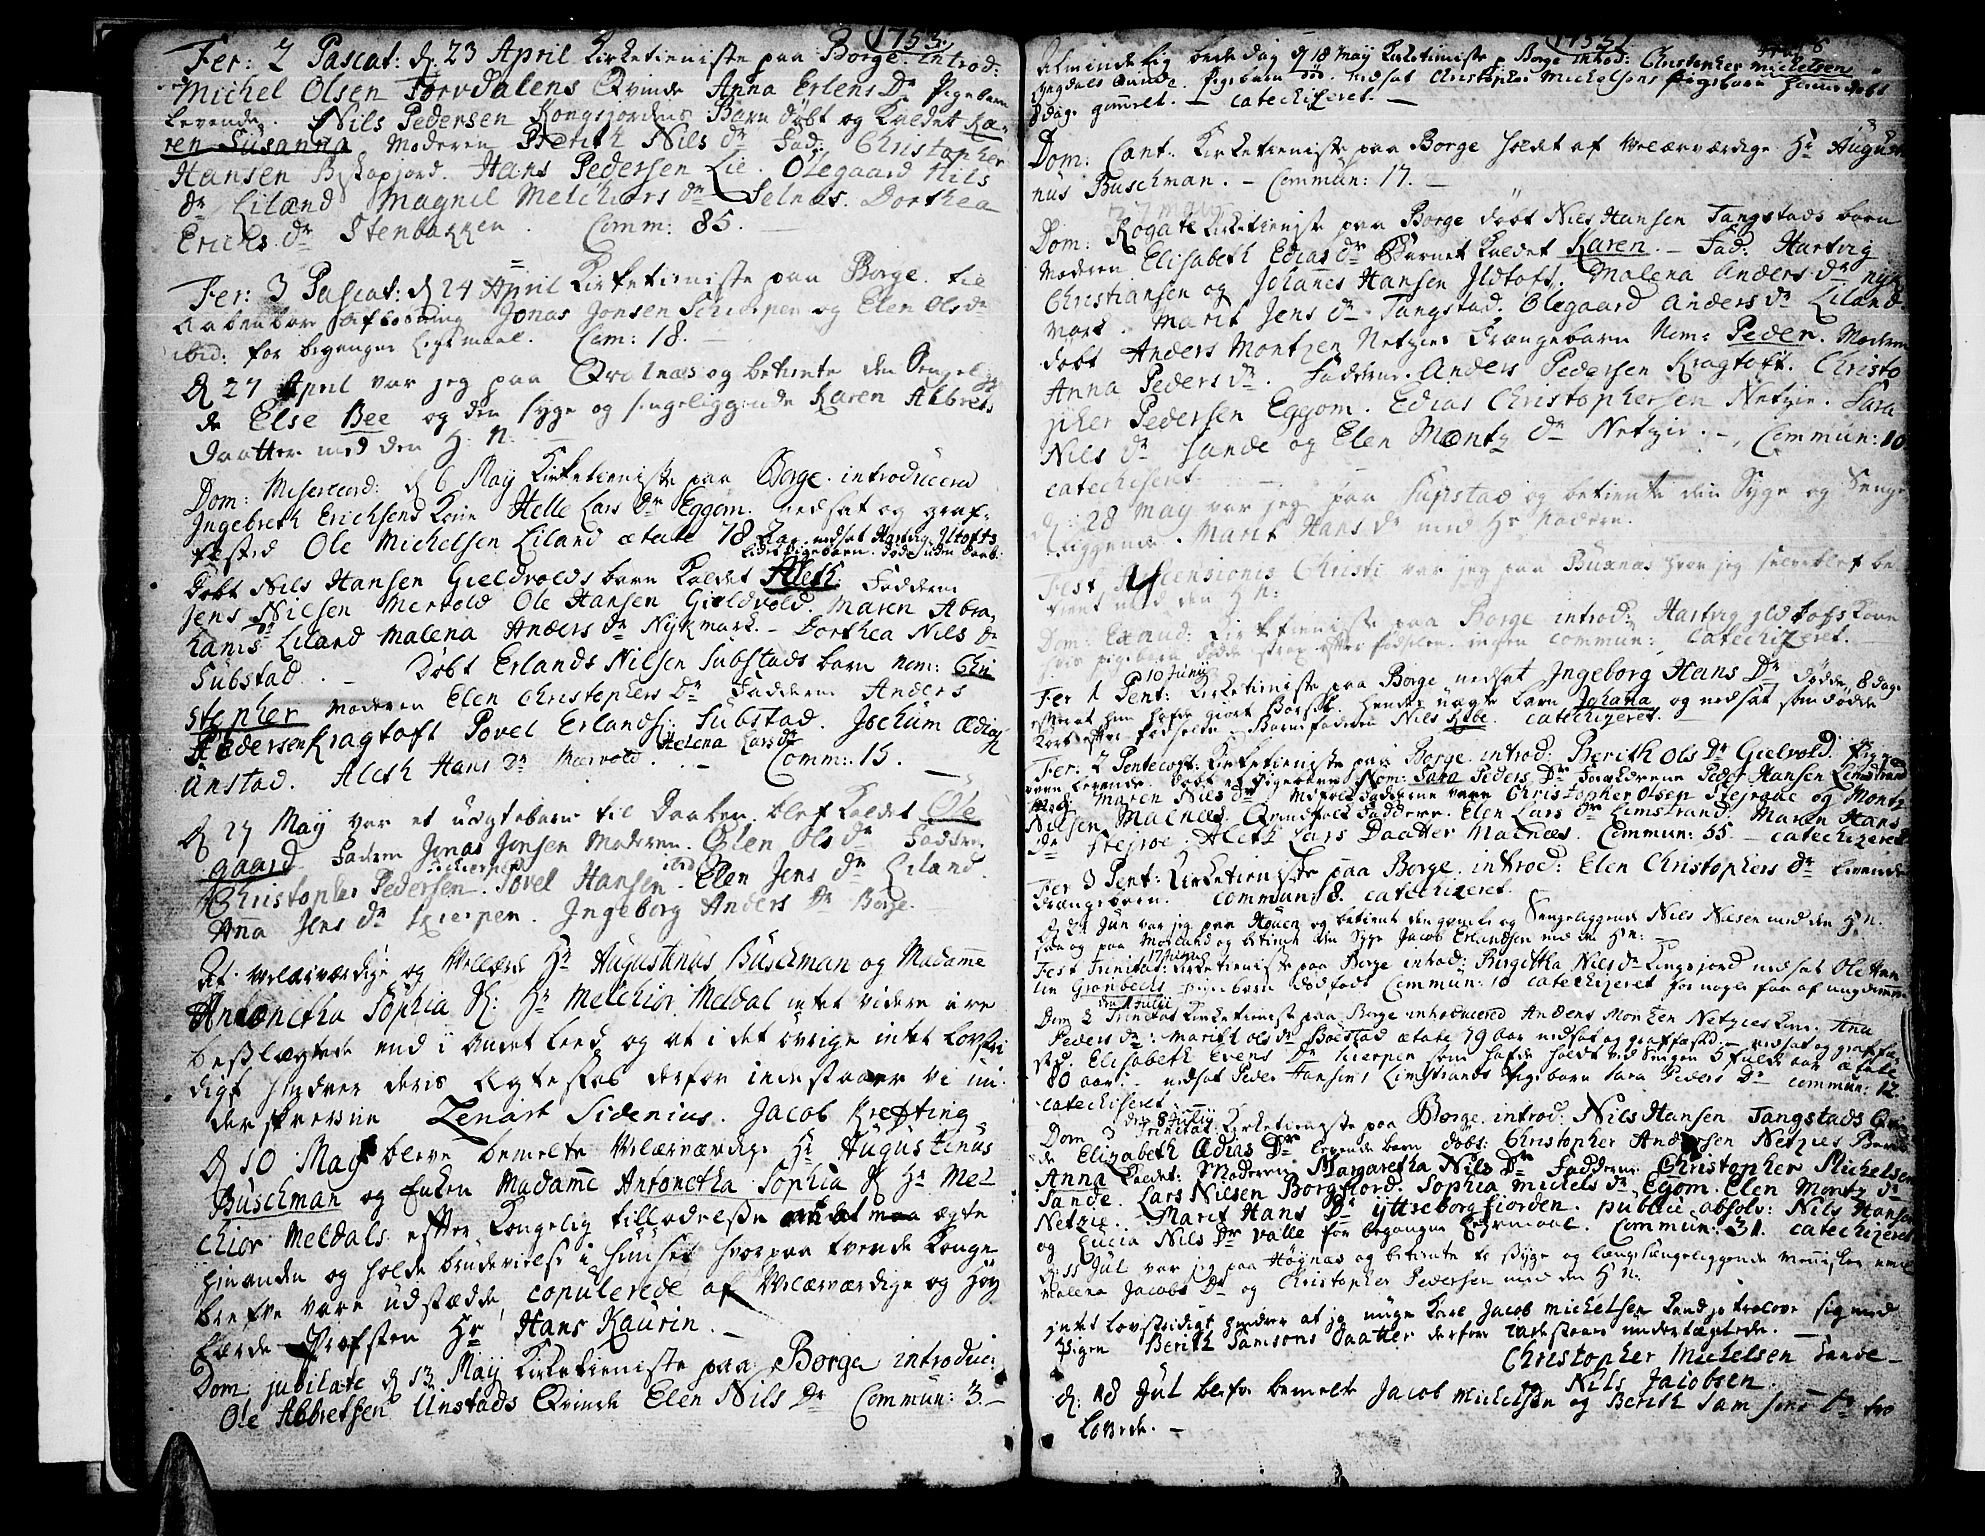 SAT, Ministerialprotokoller, klokkerbøker og fødselsregistre - Nordland, 880/L1127: Ministerialbok nr. 880A01, 1750-1774